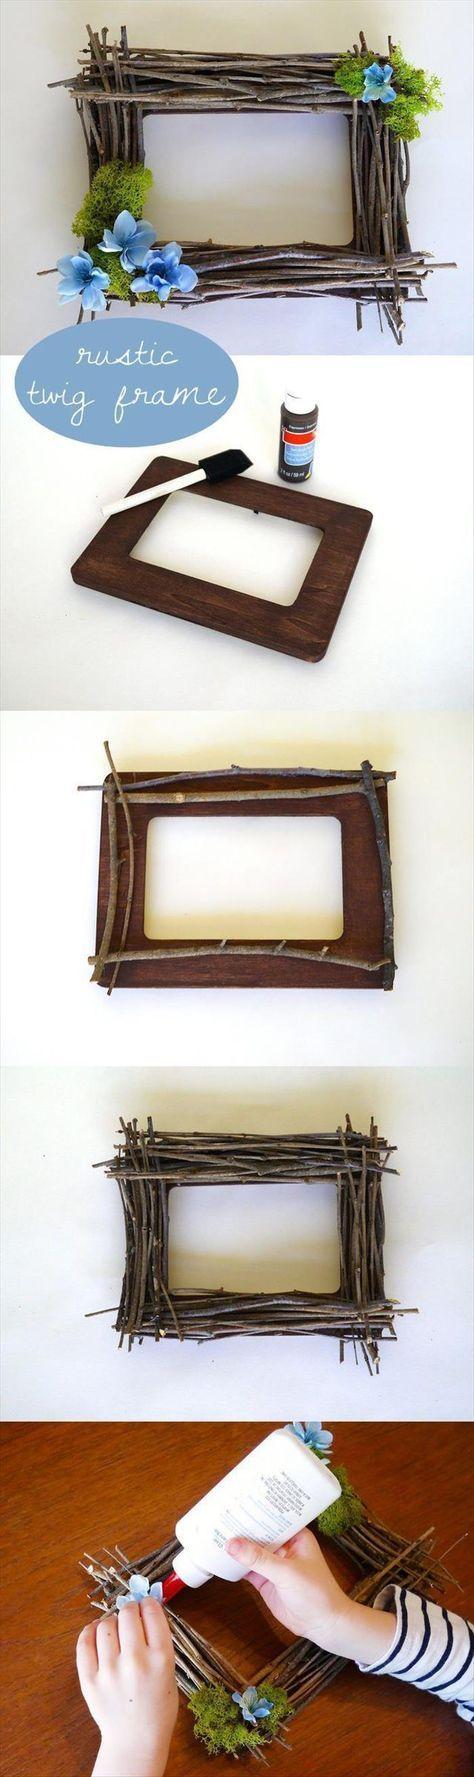 Top Ten DIY Crafts Of The Week!